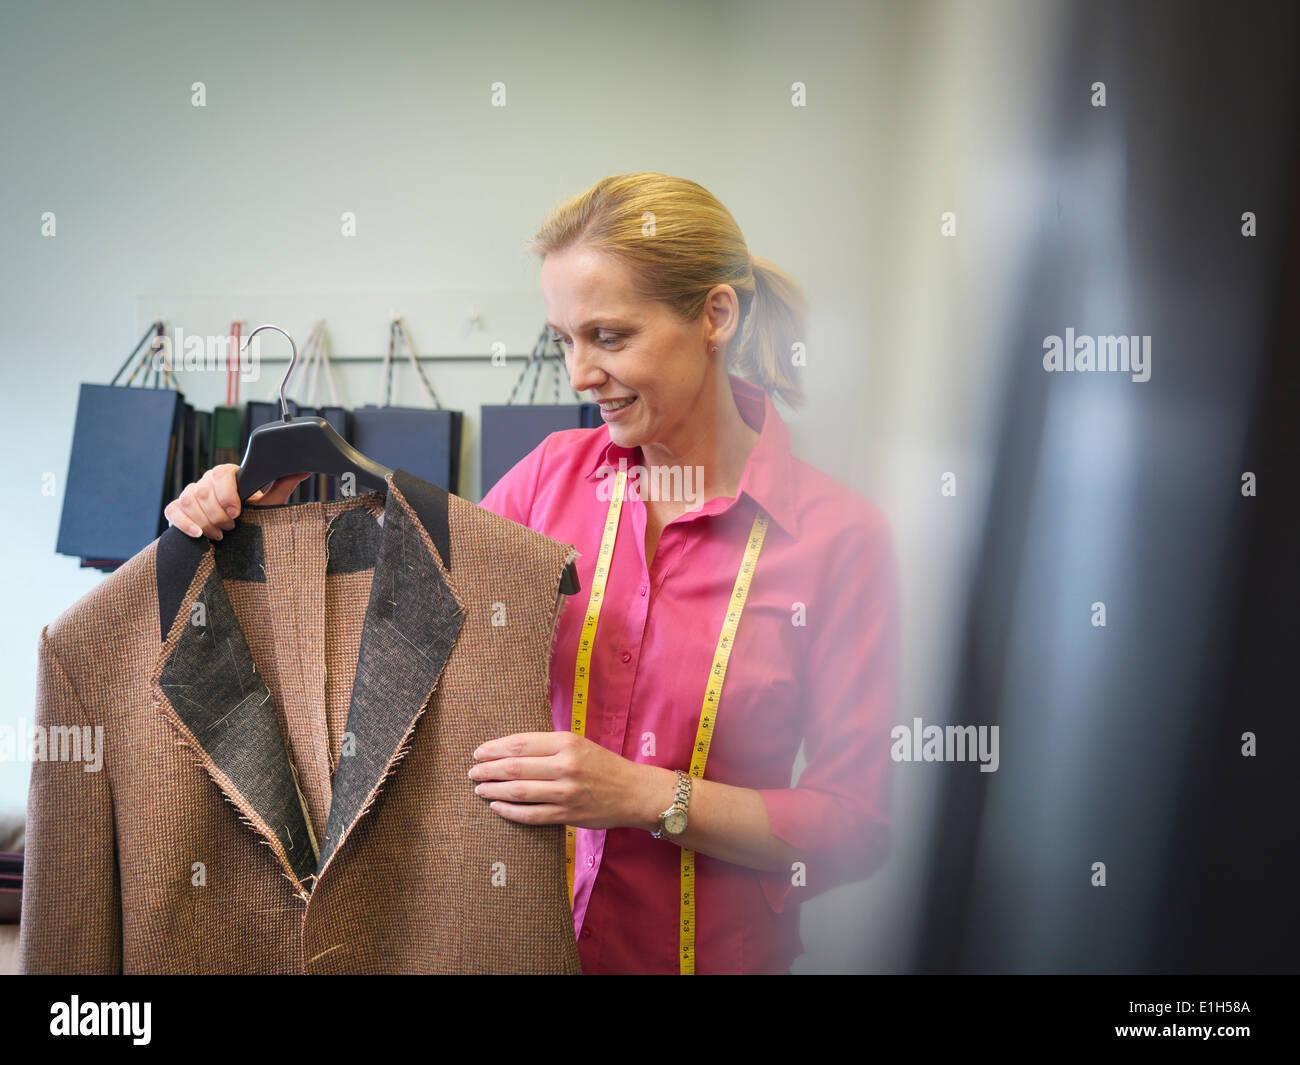 Arbeitnehmerin Inspektion Jacke in Kleiderfabrik Stockbild